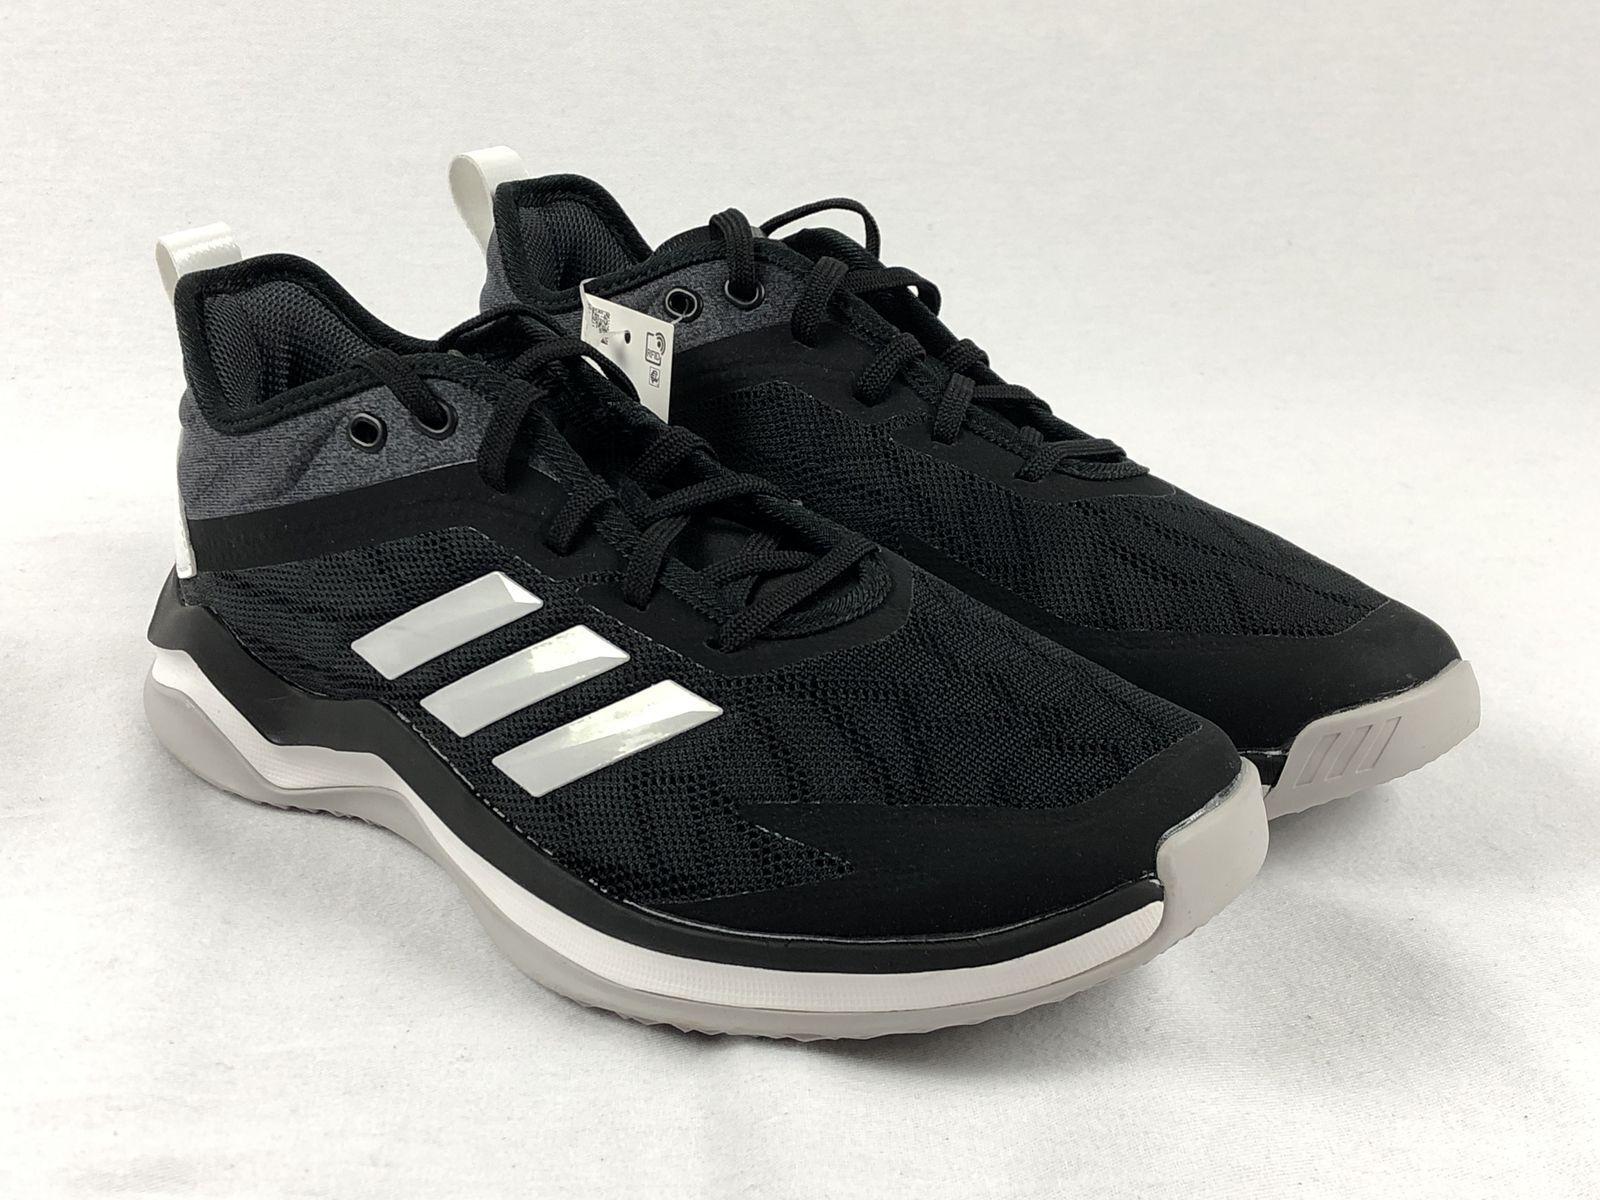 NEW adidas Speed Trainer 4 - Running, Cross Training (Men's Multiple Sizes)